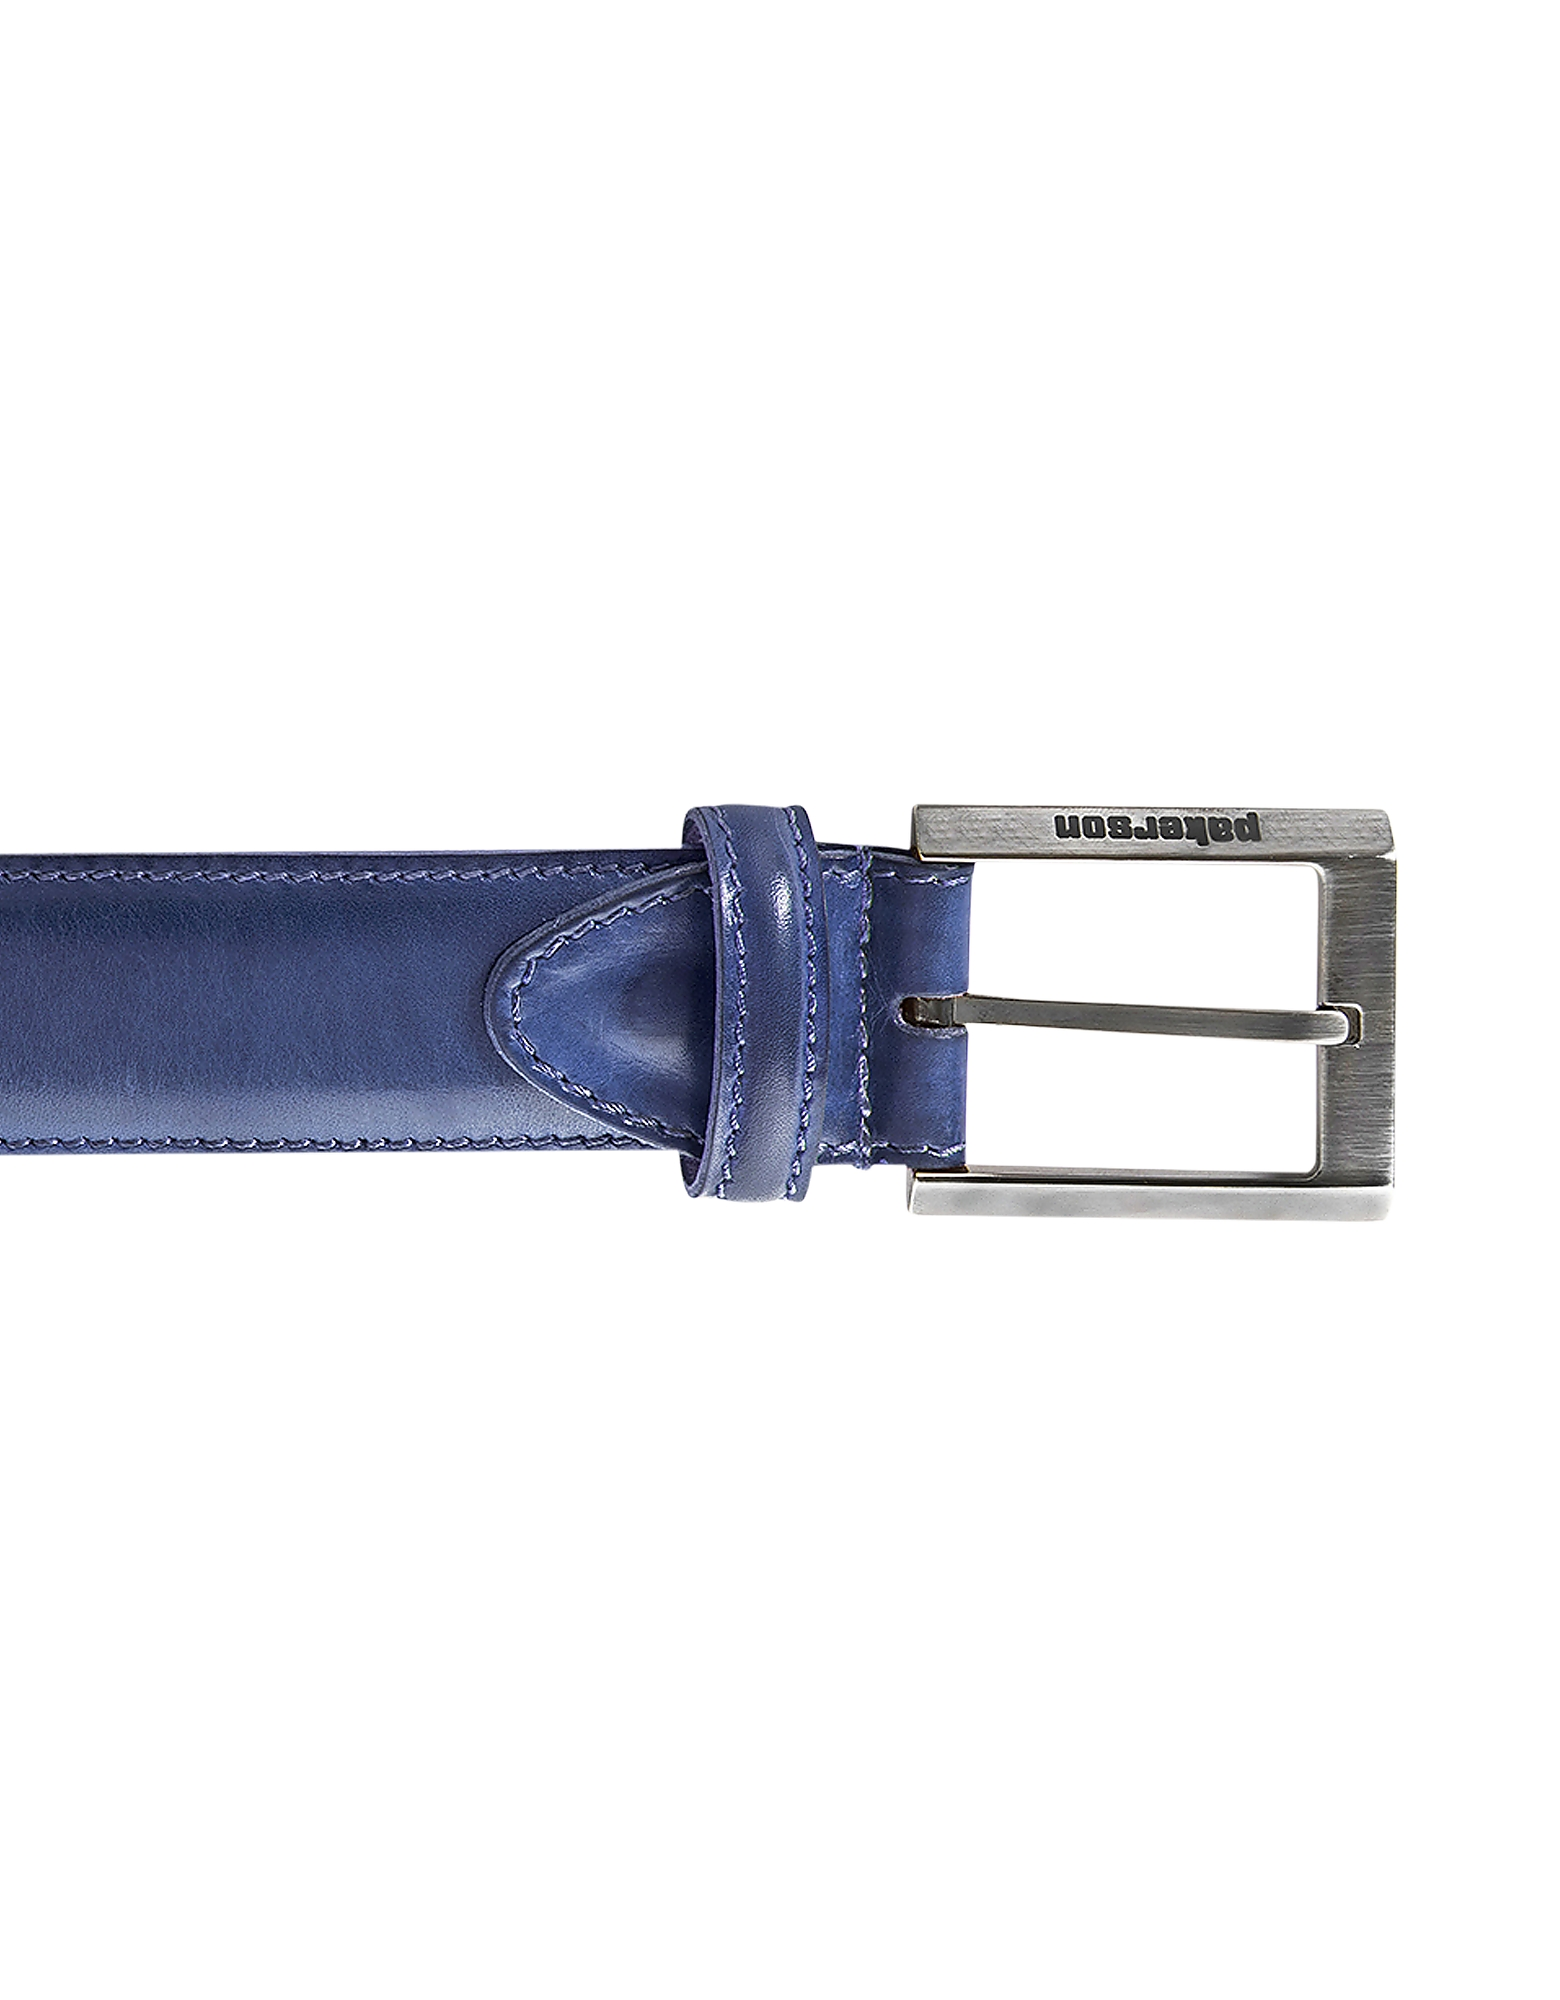 Pakerson Designer Men's Belts, Volterra Navy Blue Handmade Italian Leather Belt